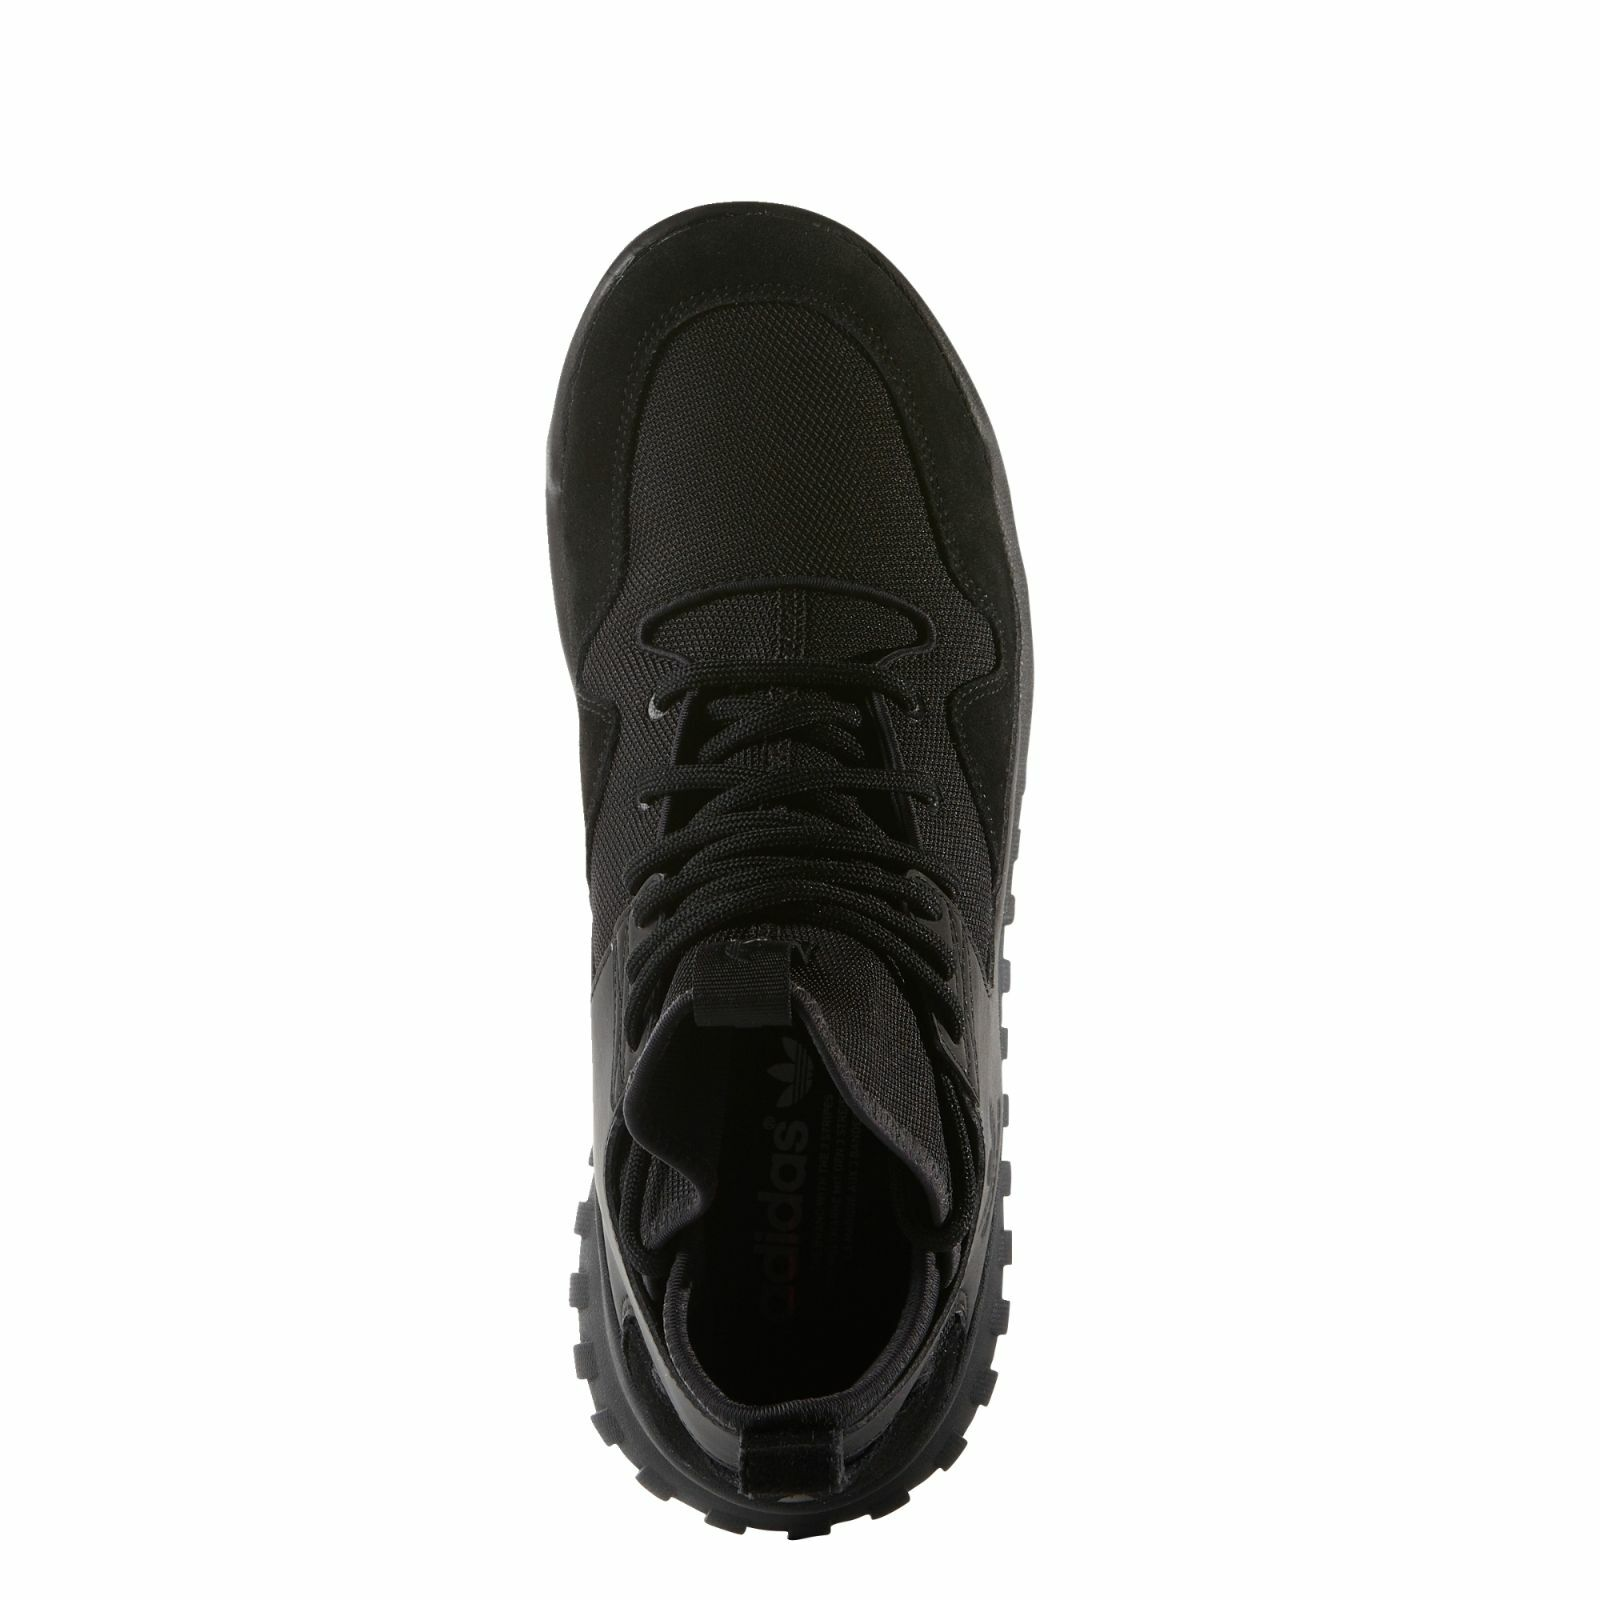 Adidas Originals TUBULAR X NEU PK S74922 CBLACK/CBLACK Turnschuhe Primeknit NEU X SALE a48b13